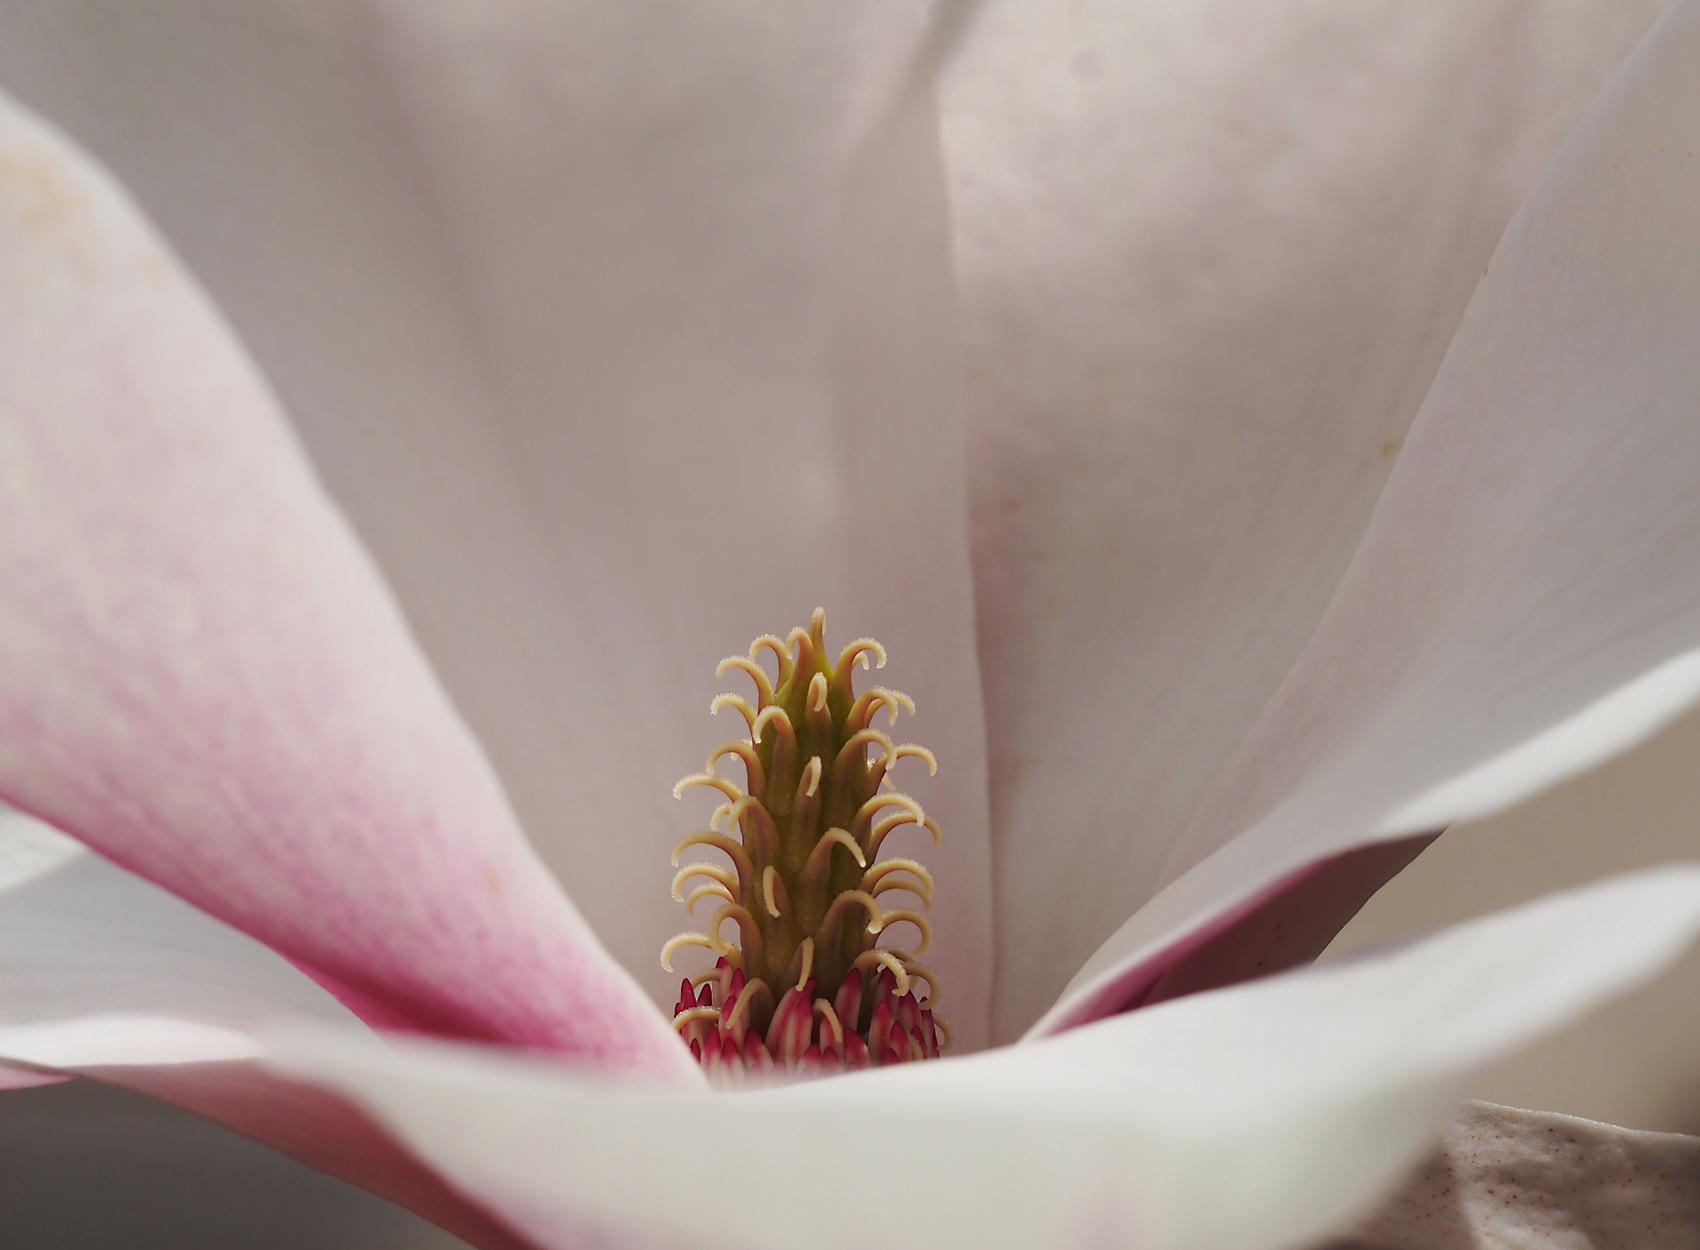 Yulan-Magnolie01 (Magnolia denudata)